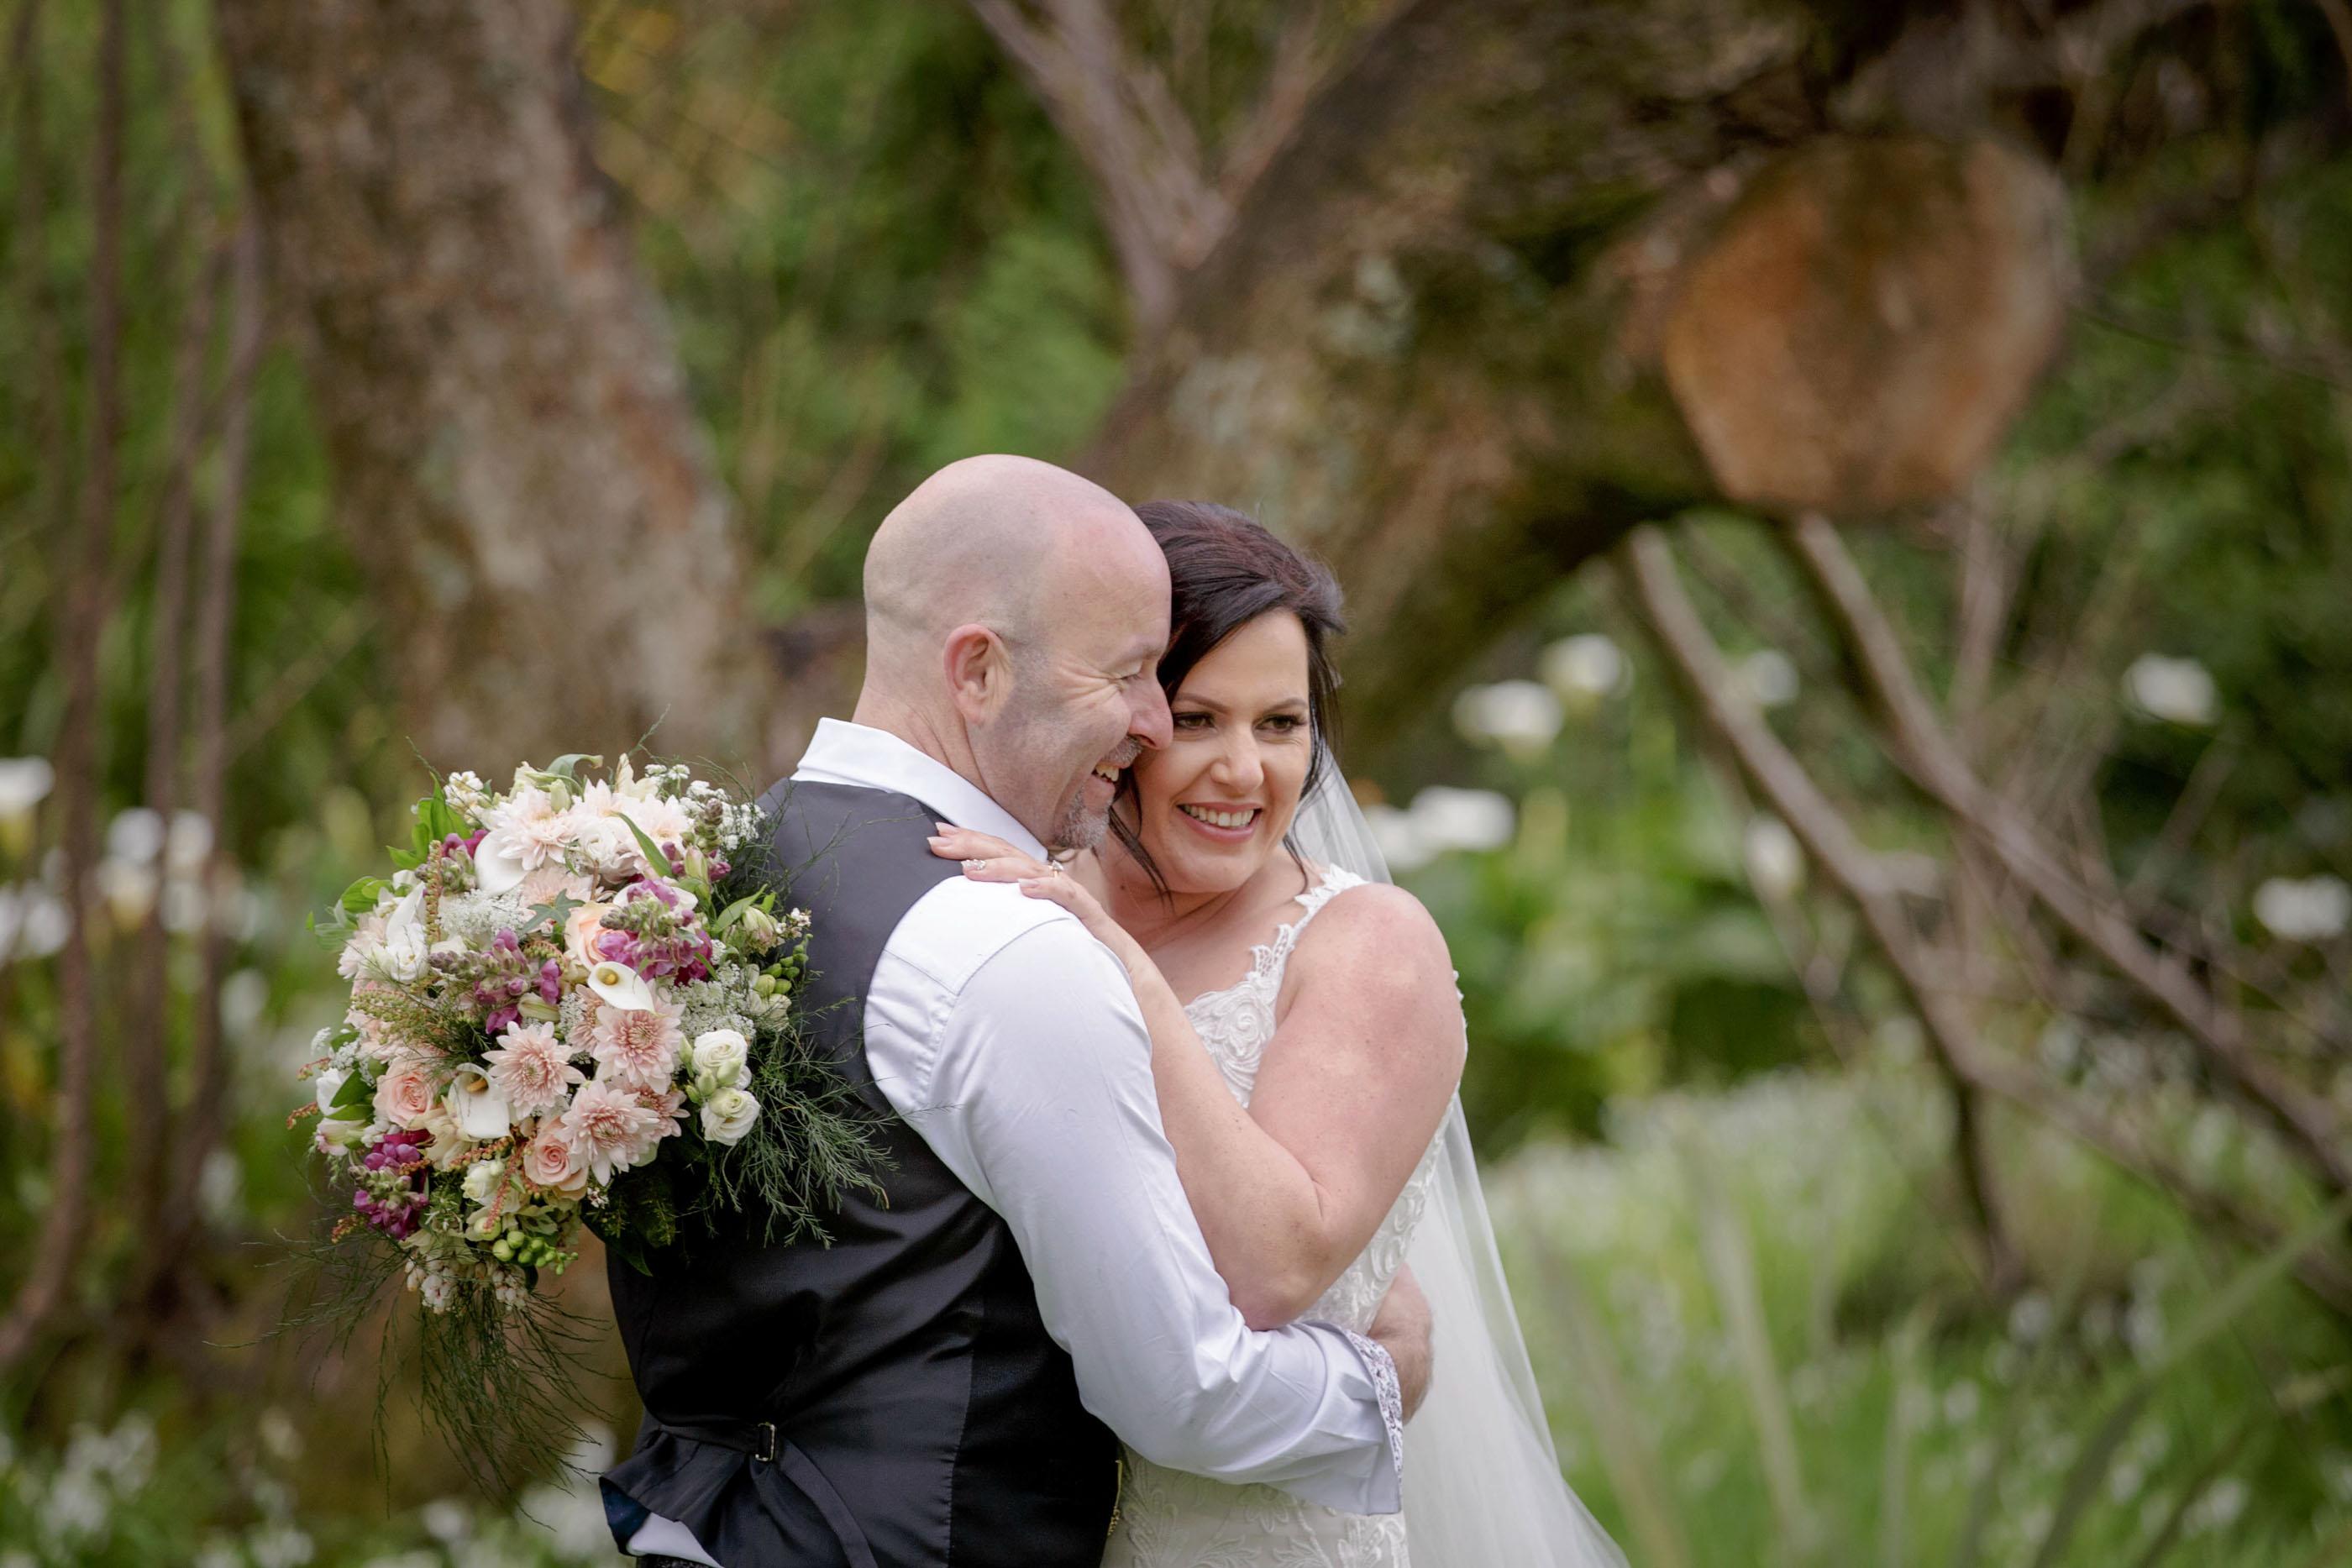 Gracehill wedding Photo by Chris Loufte